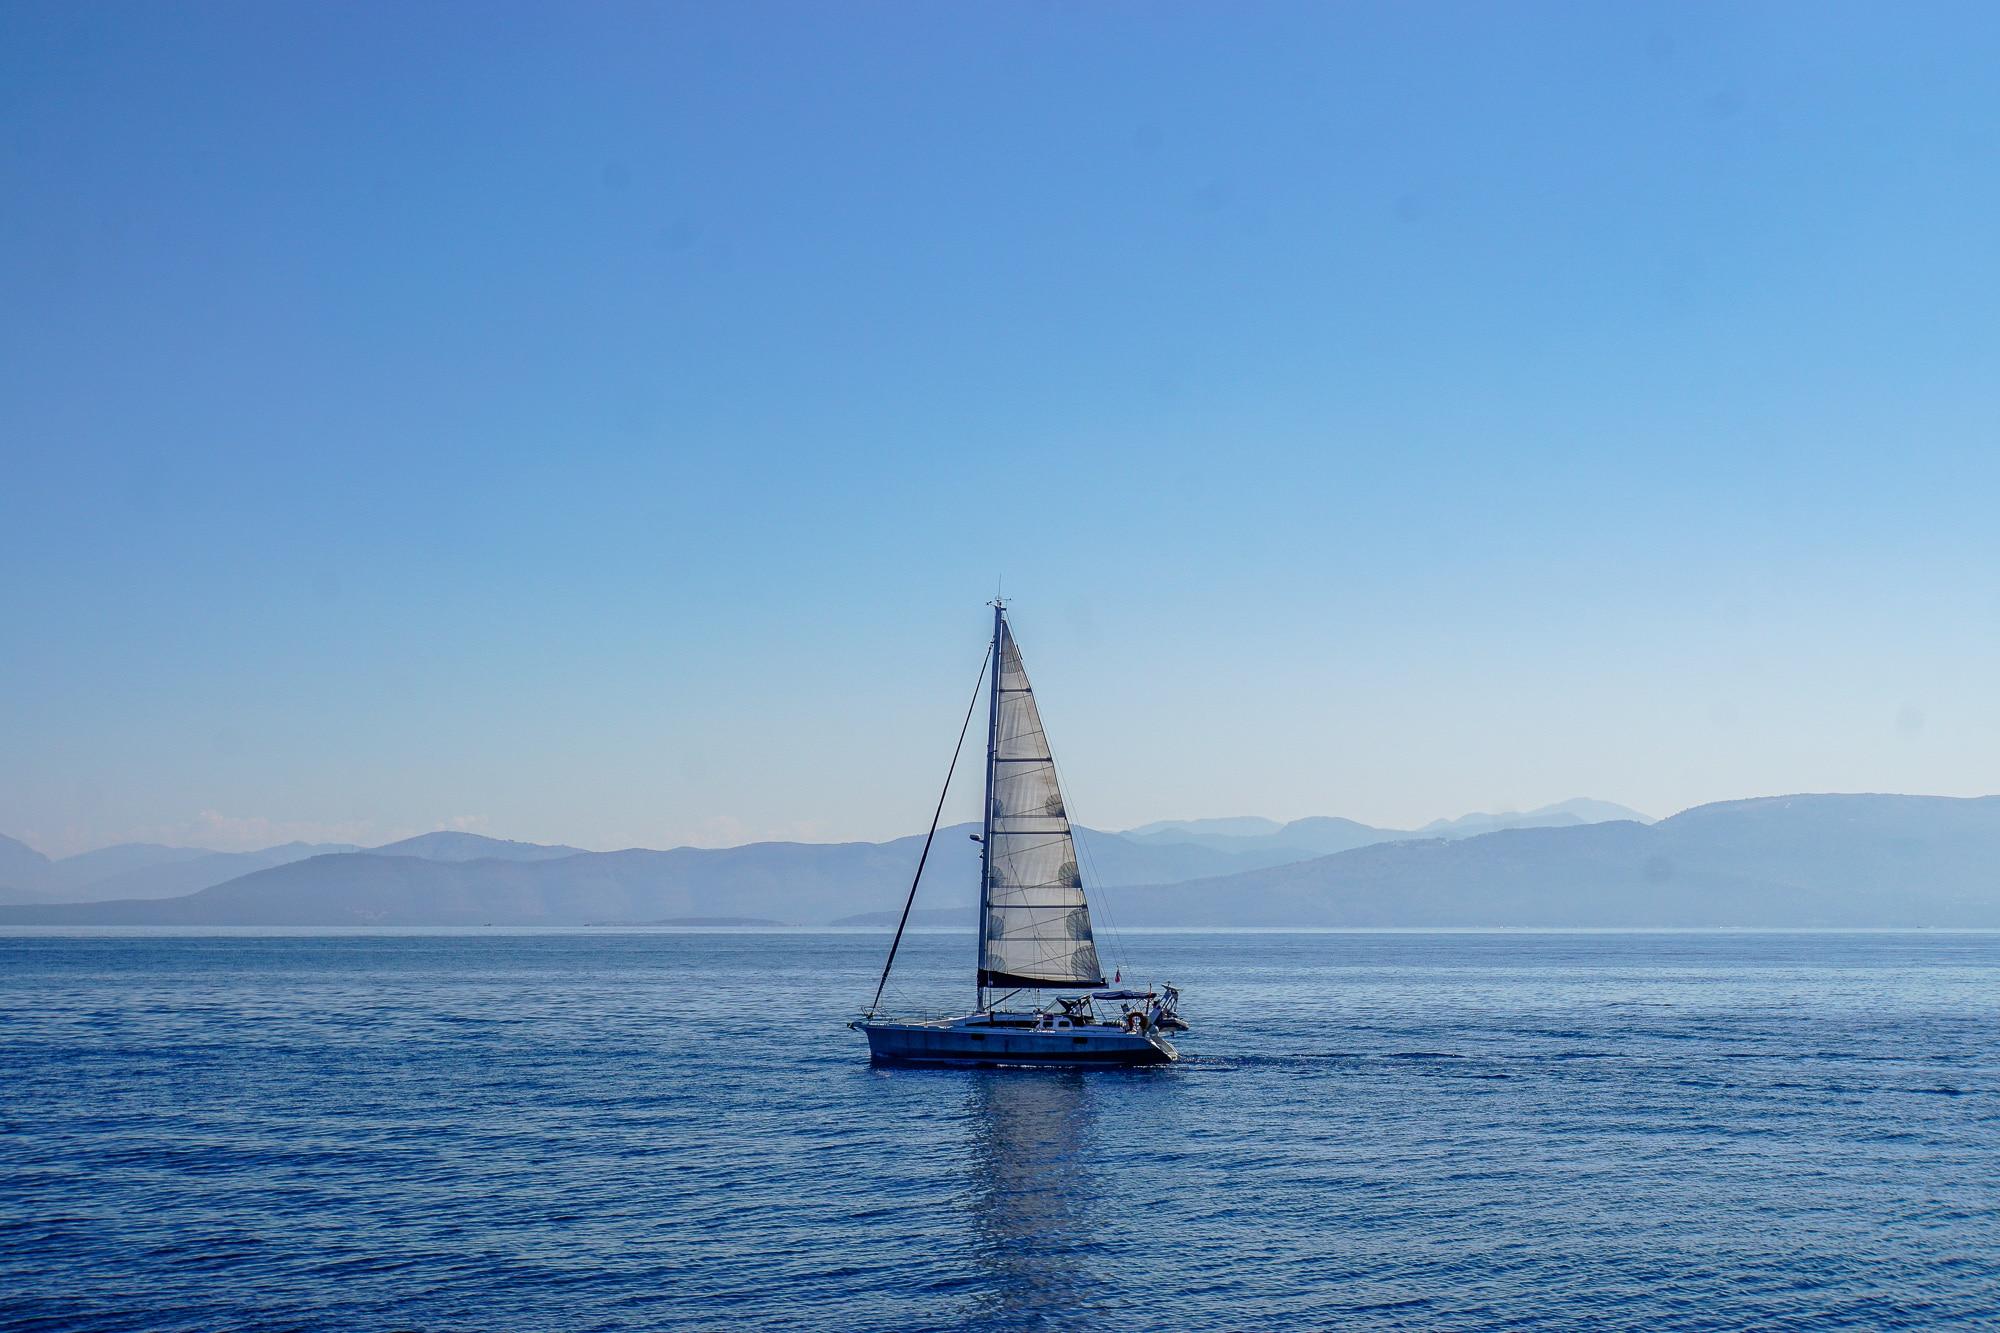 Insel, Insel, Berge: Drei neue Reiseziele im Dezember